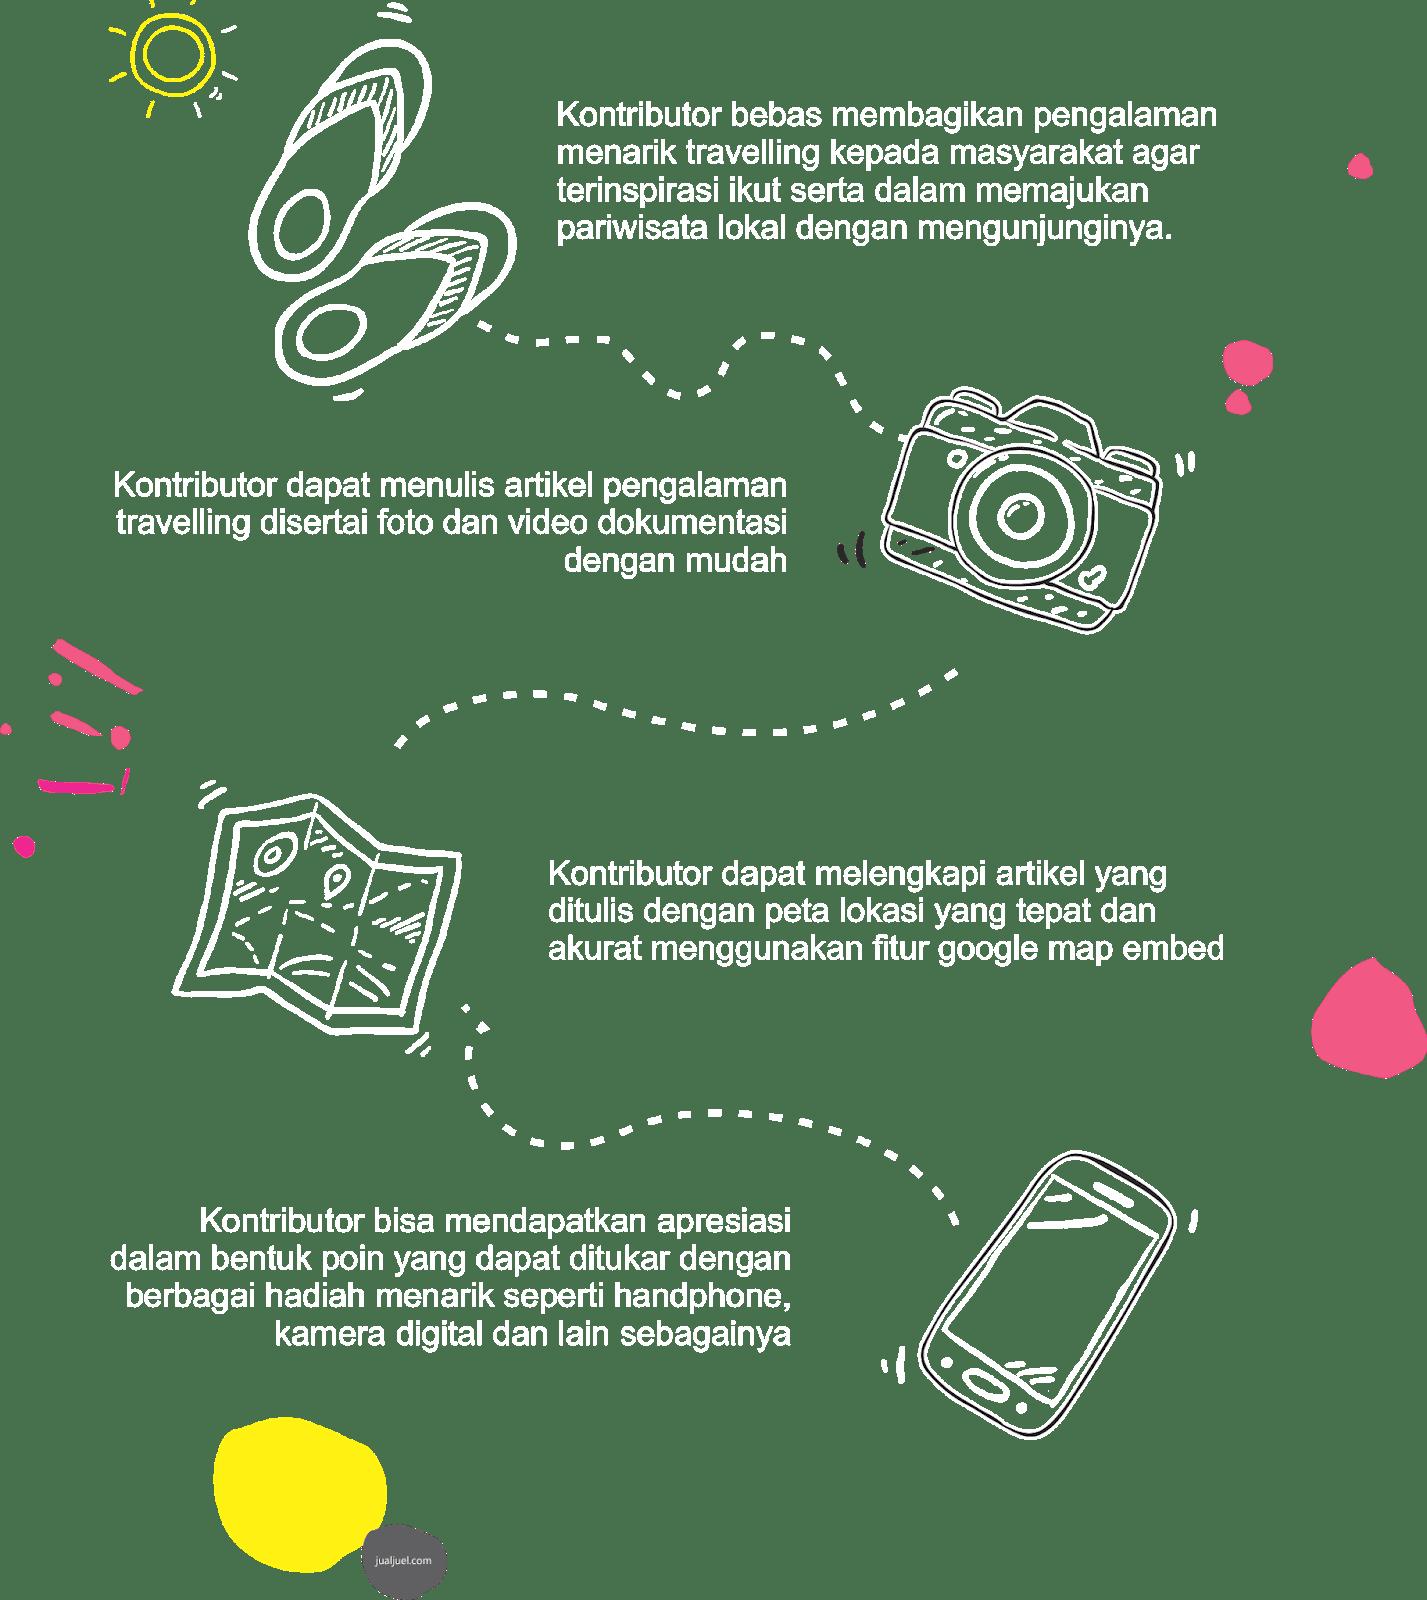 fitur bagi kontributor